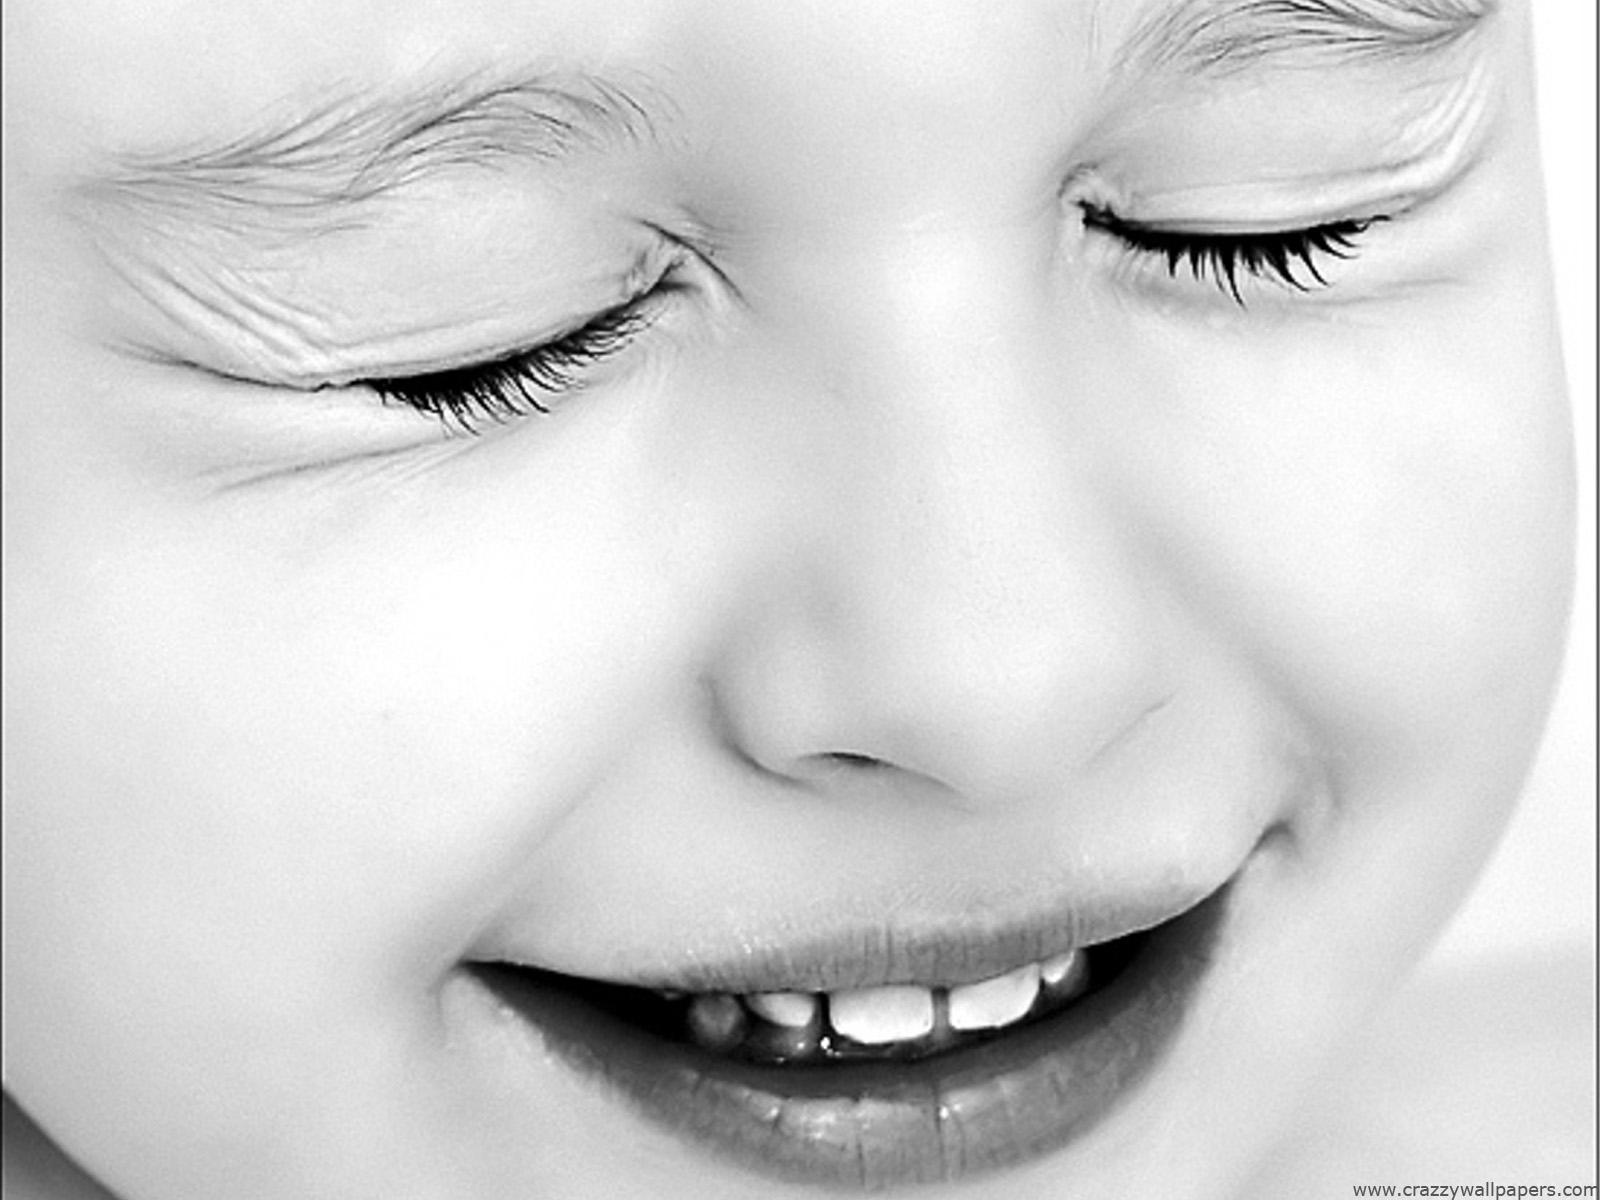 http://2.bp.blogspot.com/-qW8gAGzqFj4/UOmY5DZ450I/AAAAAAAADcc/yMN5Bo6S8Ok/s1600/cute_baby_black_and_white-normal.jpg